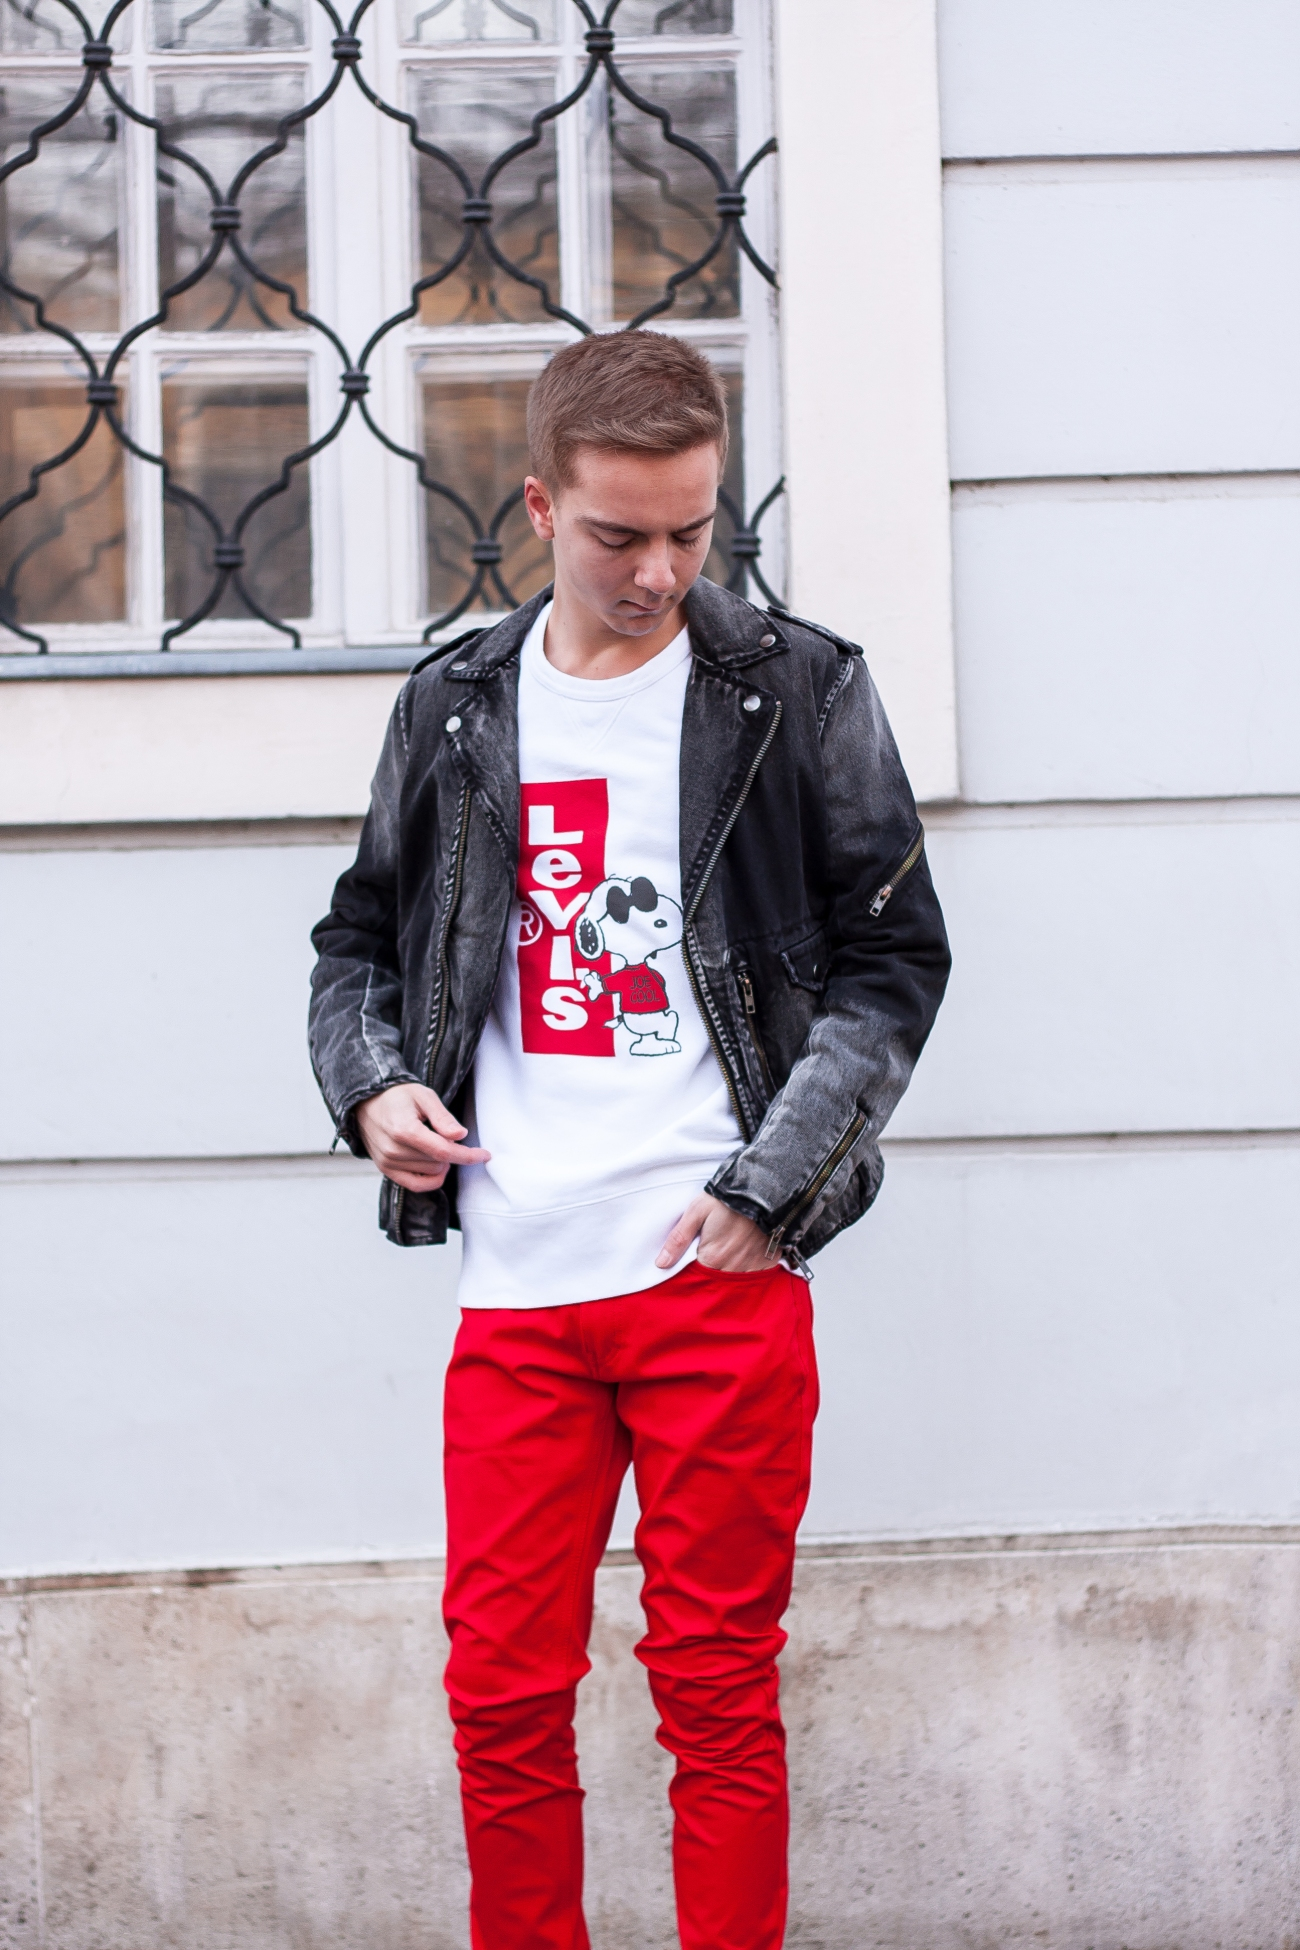 balazs-zsalek-levi's-snoopy-sweater-with-antony-morato-sneakers